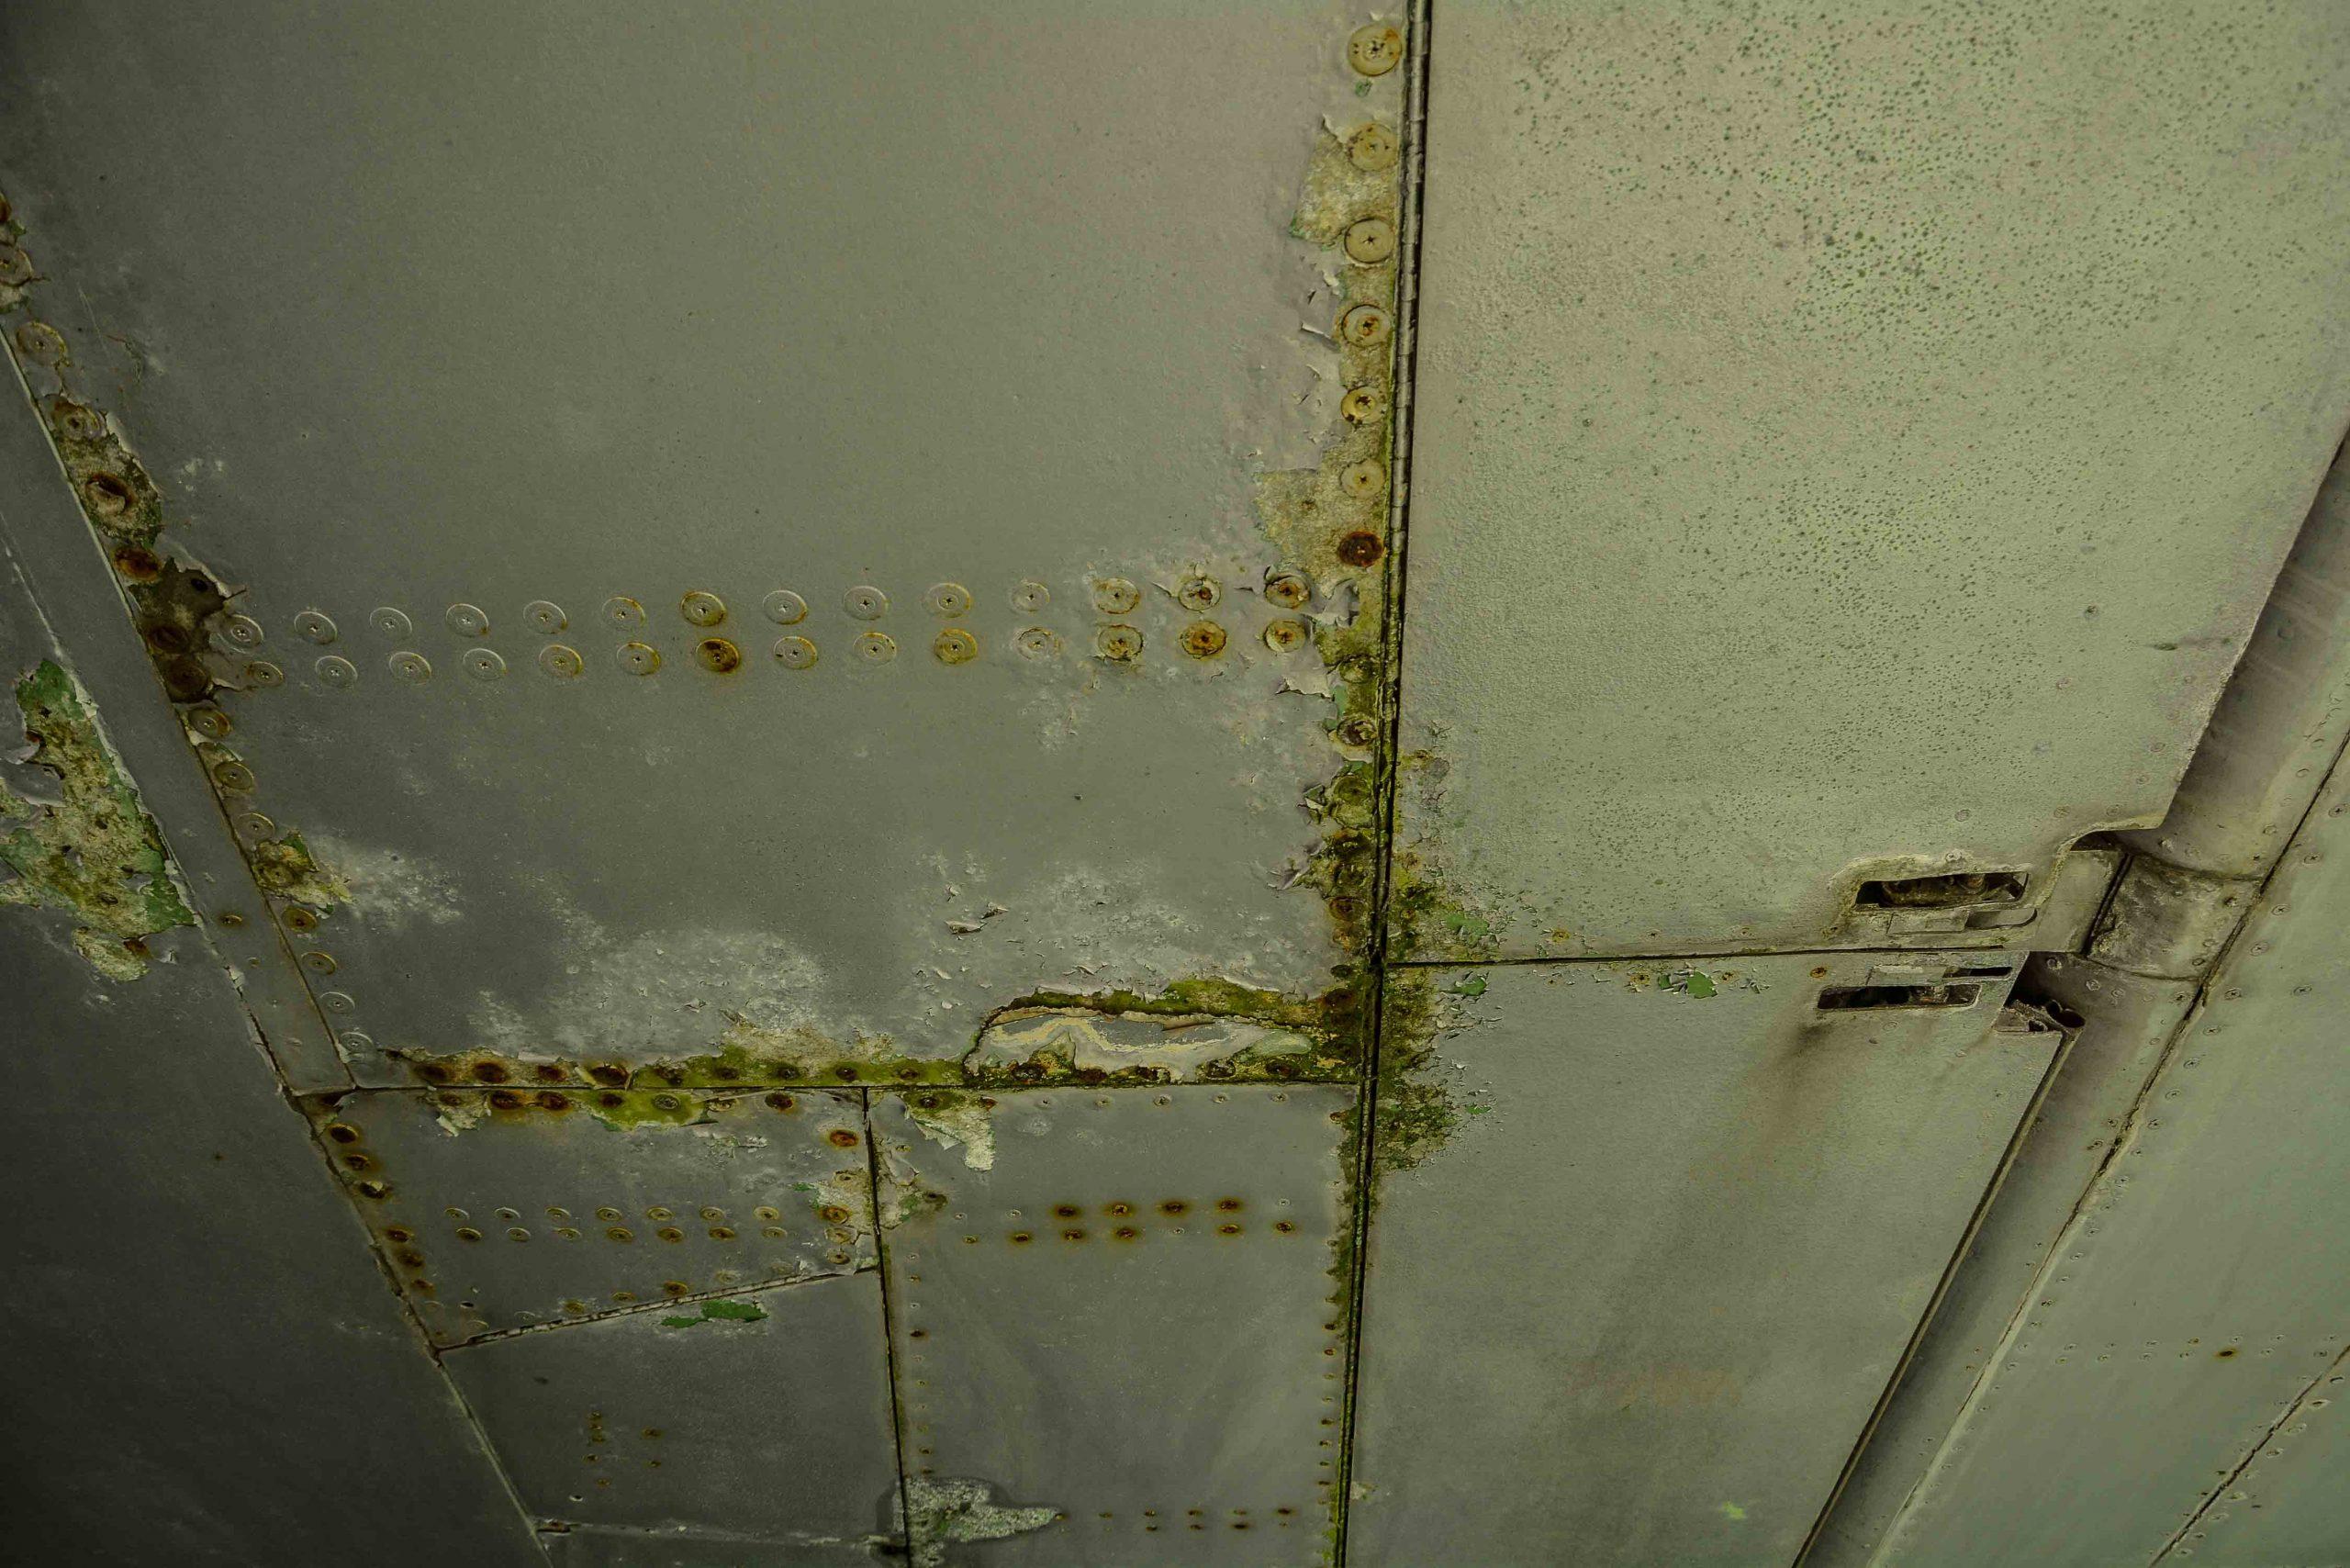 mold wing abandoned boeing 707 tegel txl flughafen airport berlin germany deutschland